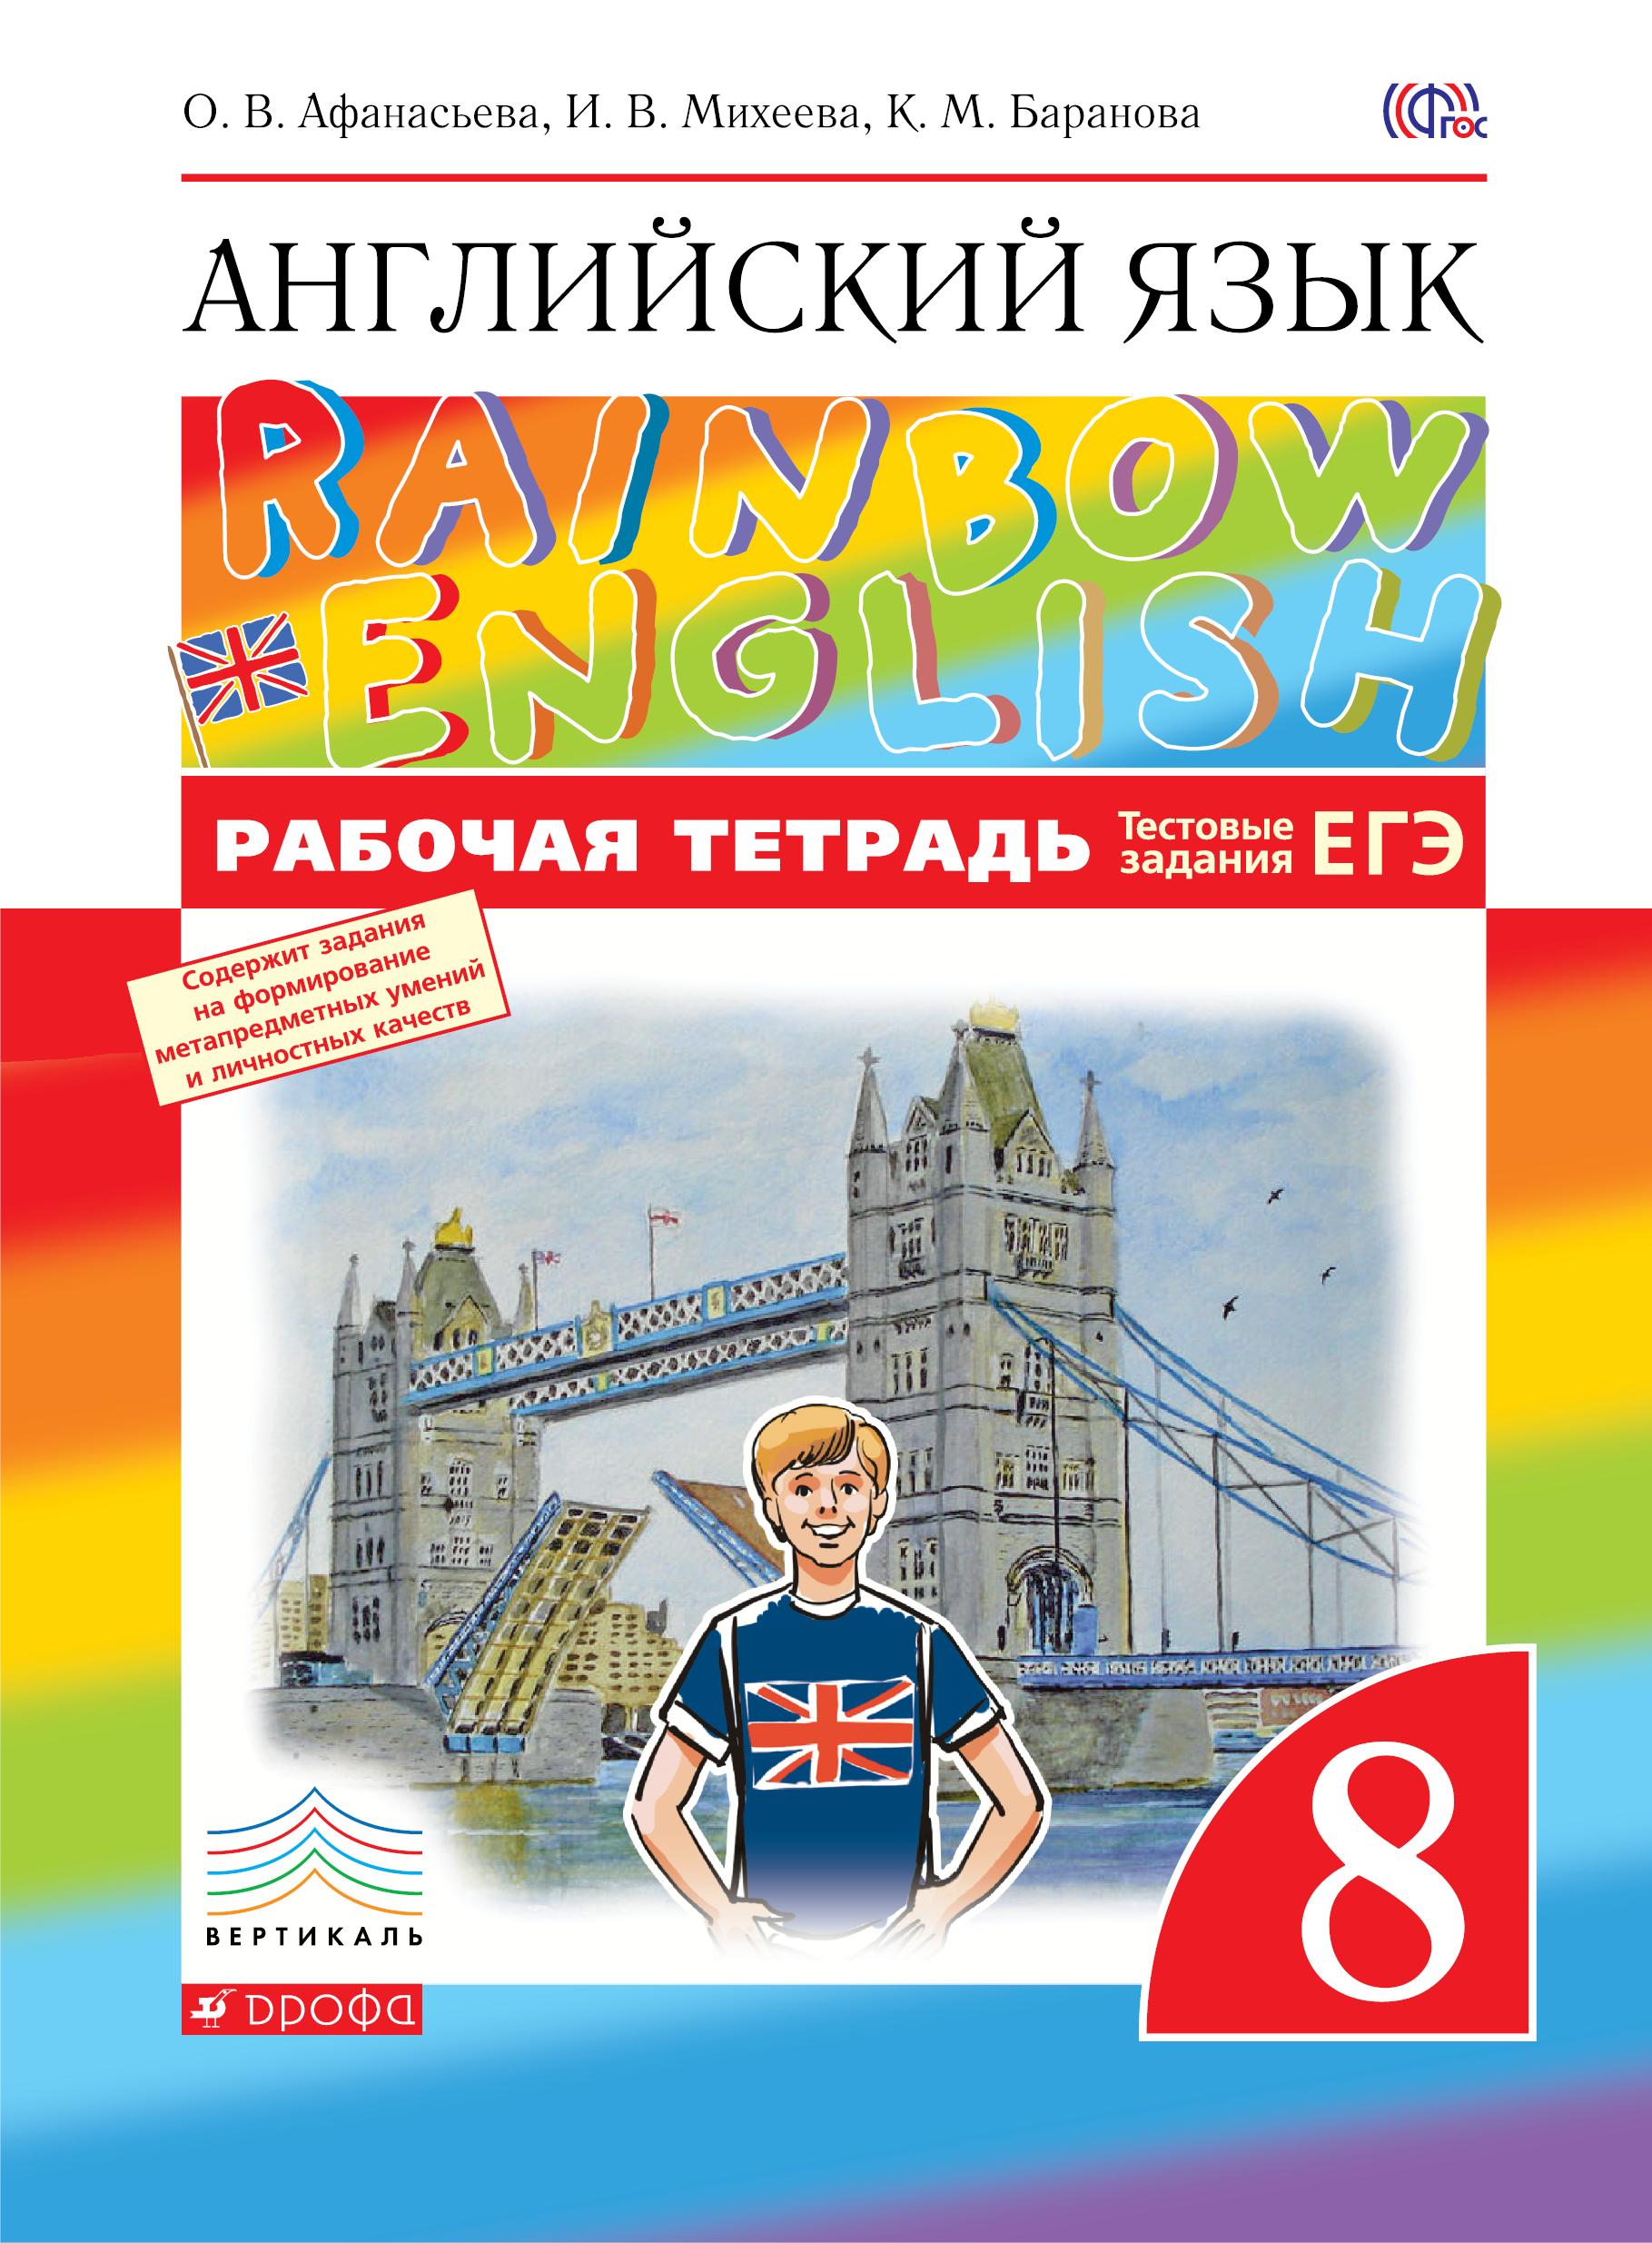 Решебник по английскому языку 8 класс афанасьева михеева дрофа